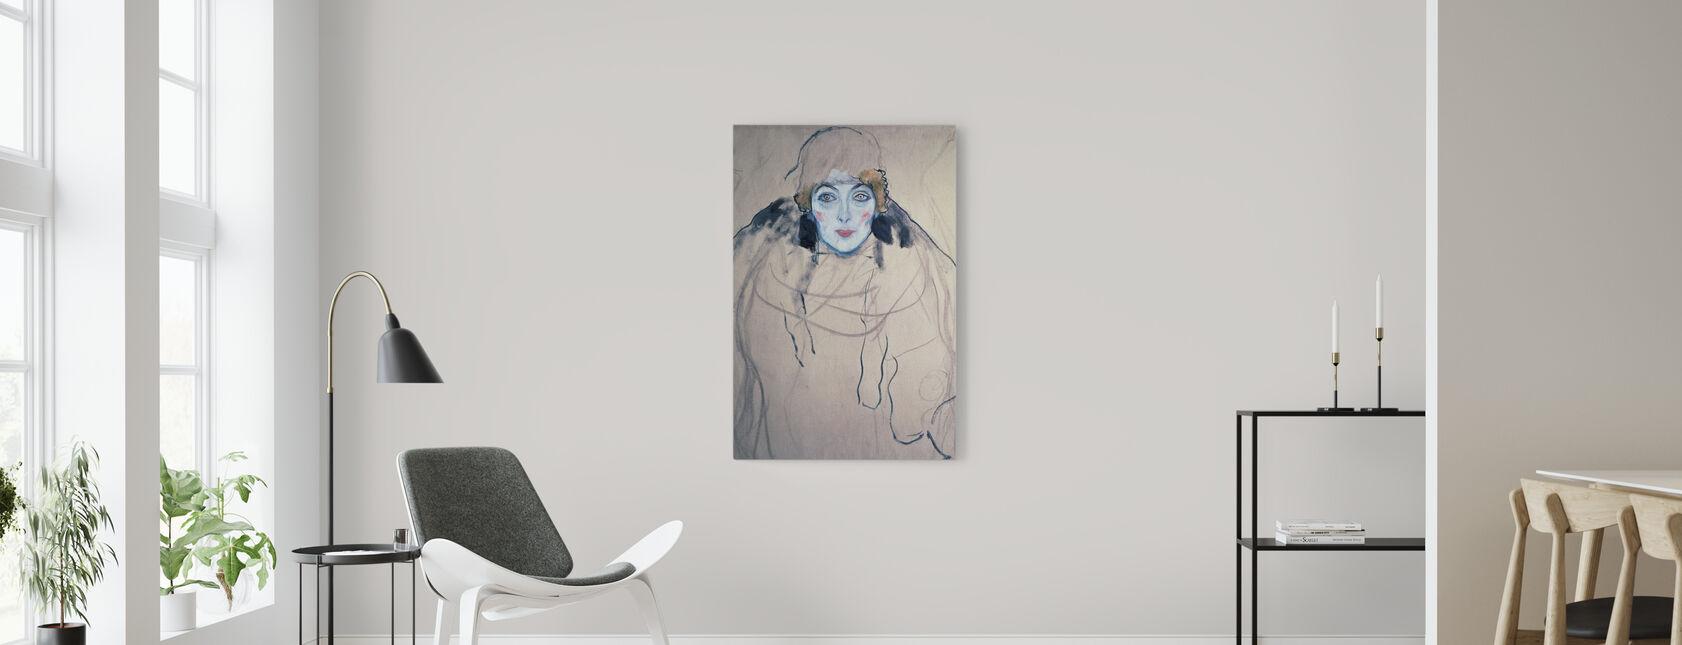 Head of a Woman, Gustav Klimt - Canvas print - Living Room